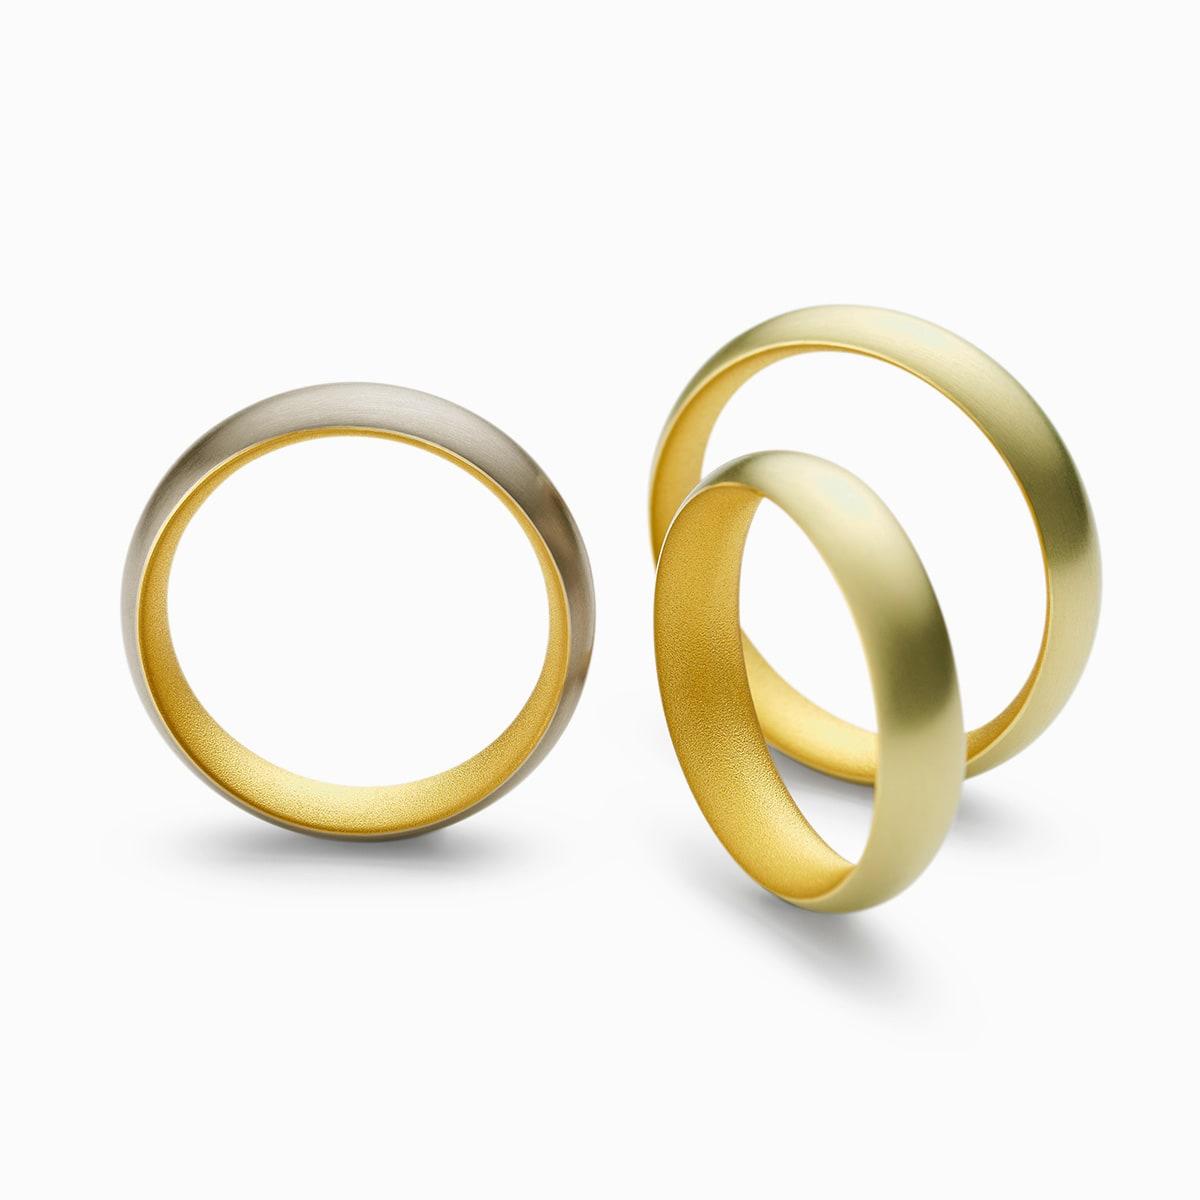 Niessing wedding ring Inside